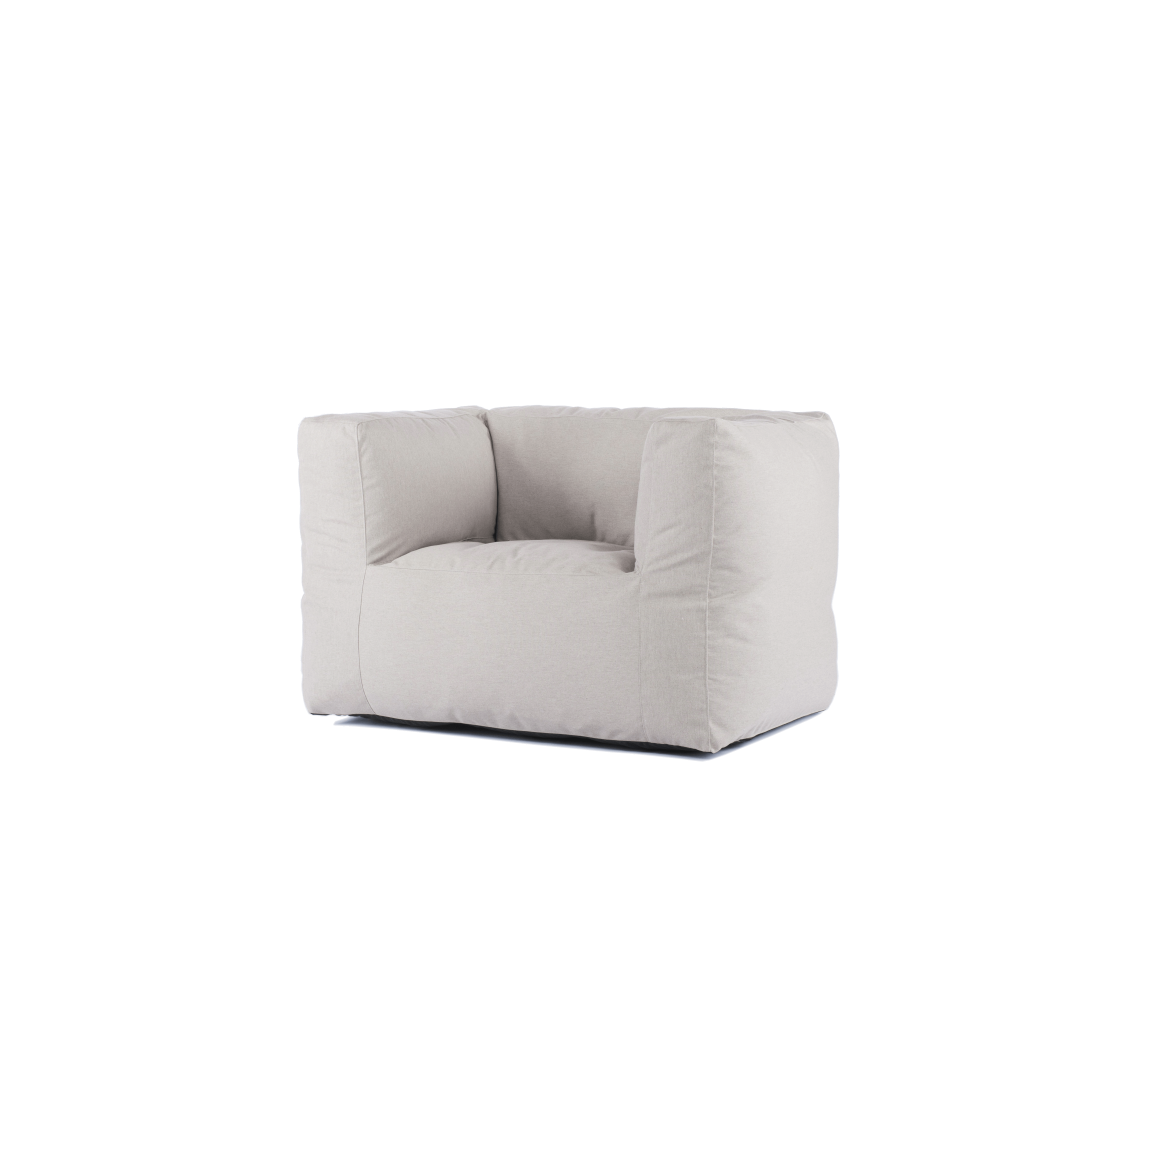 One Seat   WHITEbroken